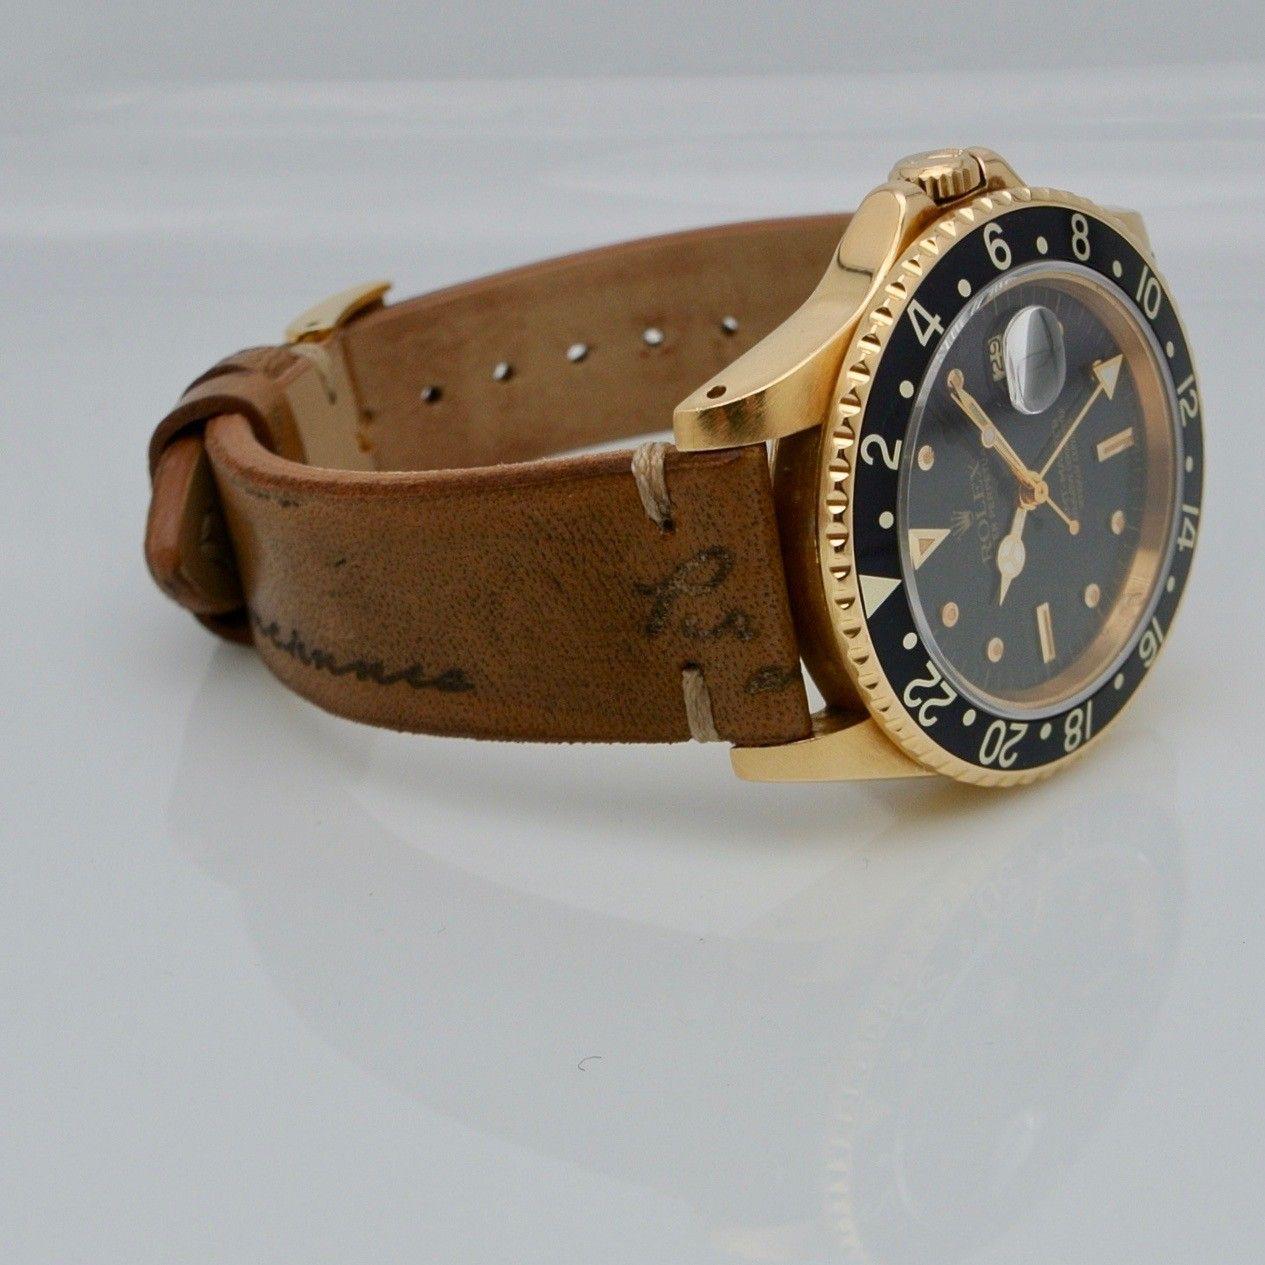 Rolex GMT-Master oro giallo nipple dial